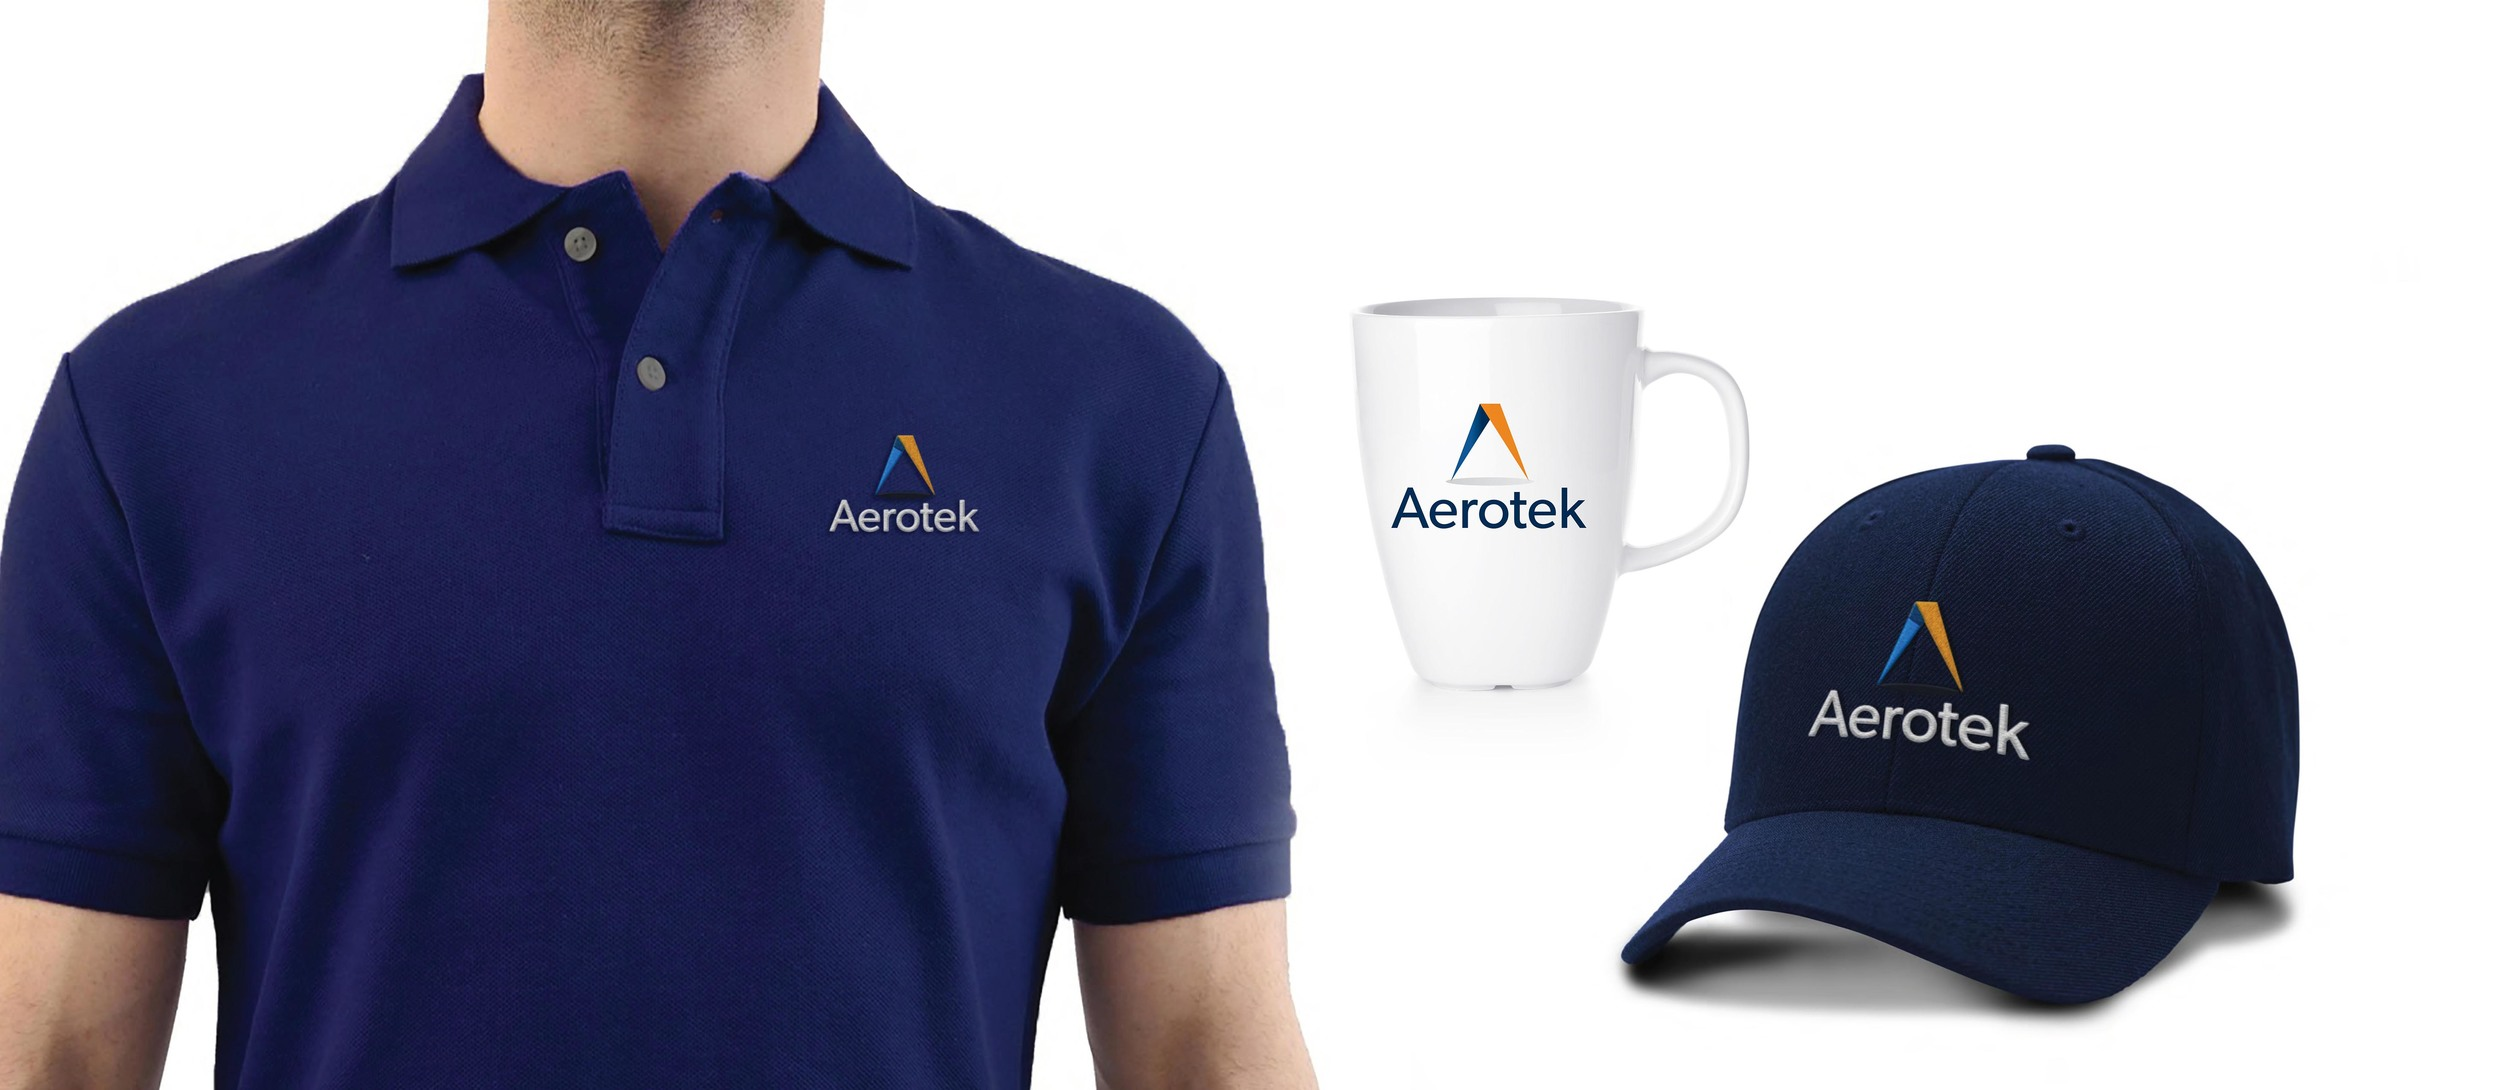 Aerotek Shirt, Cap&cup.jpg